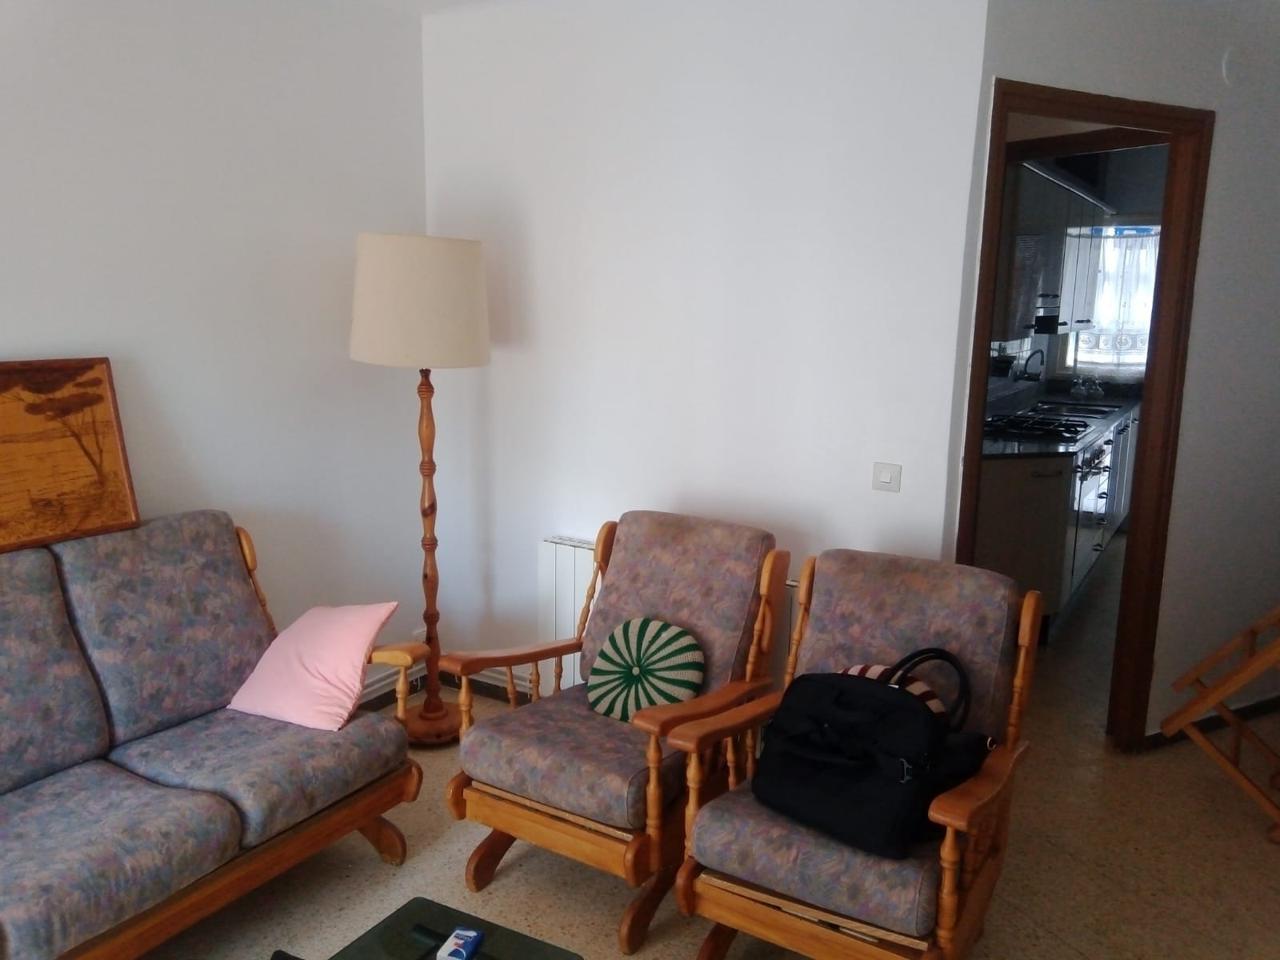 Alquiler Piso  Carretera del pla. Este piso se encuentra en carretera del pla, 43800, valls, tarra